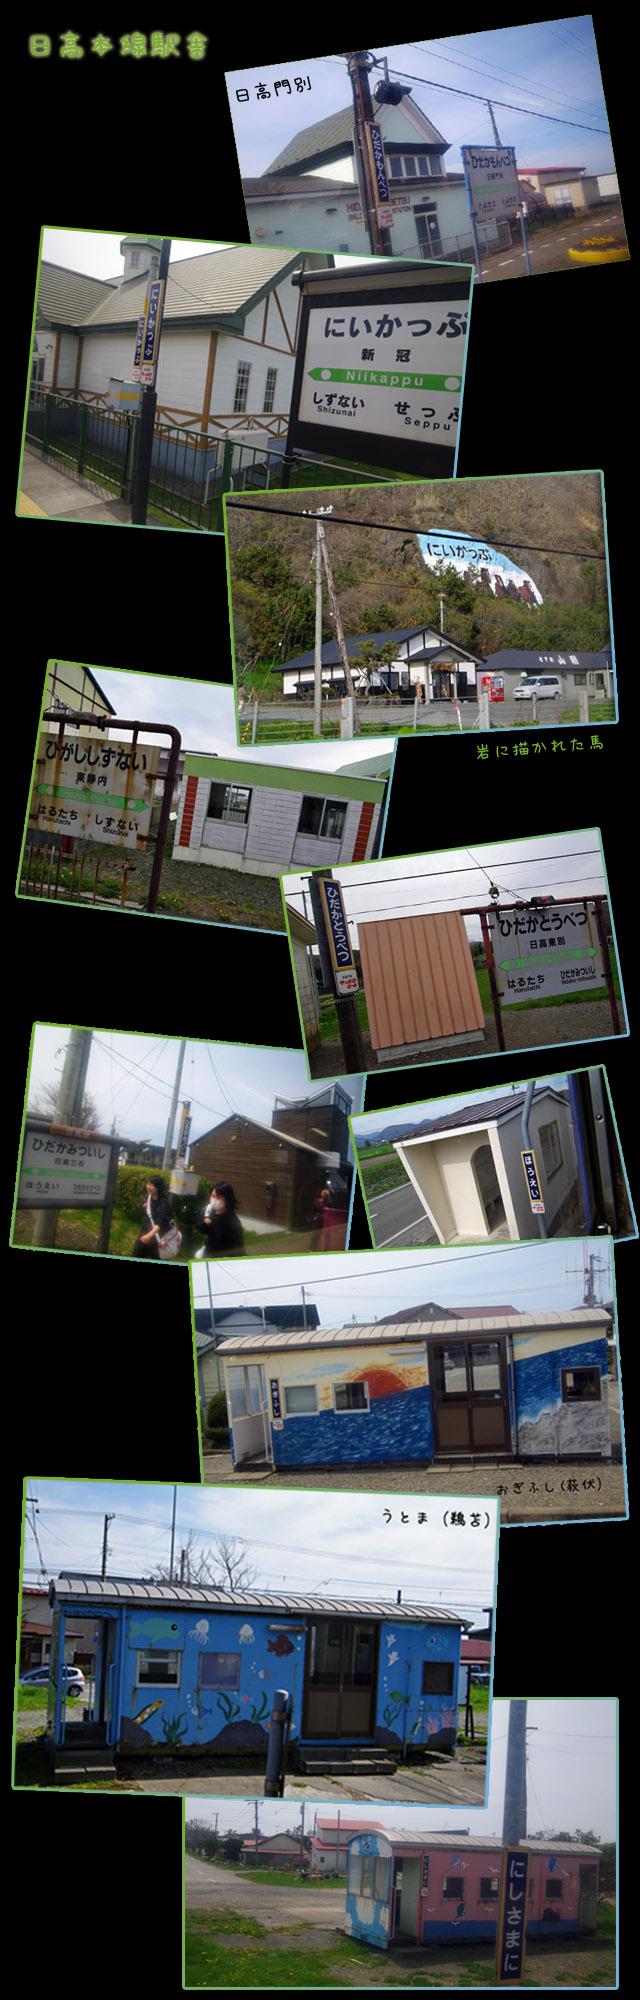 日高本線の駅舎_b0019313_1741583.jpg